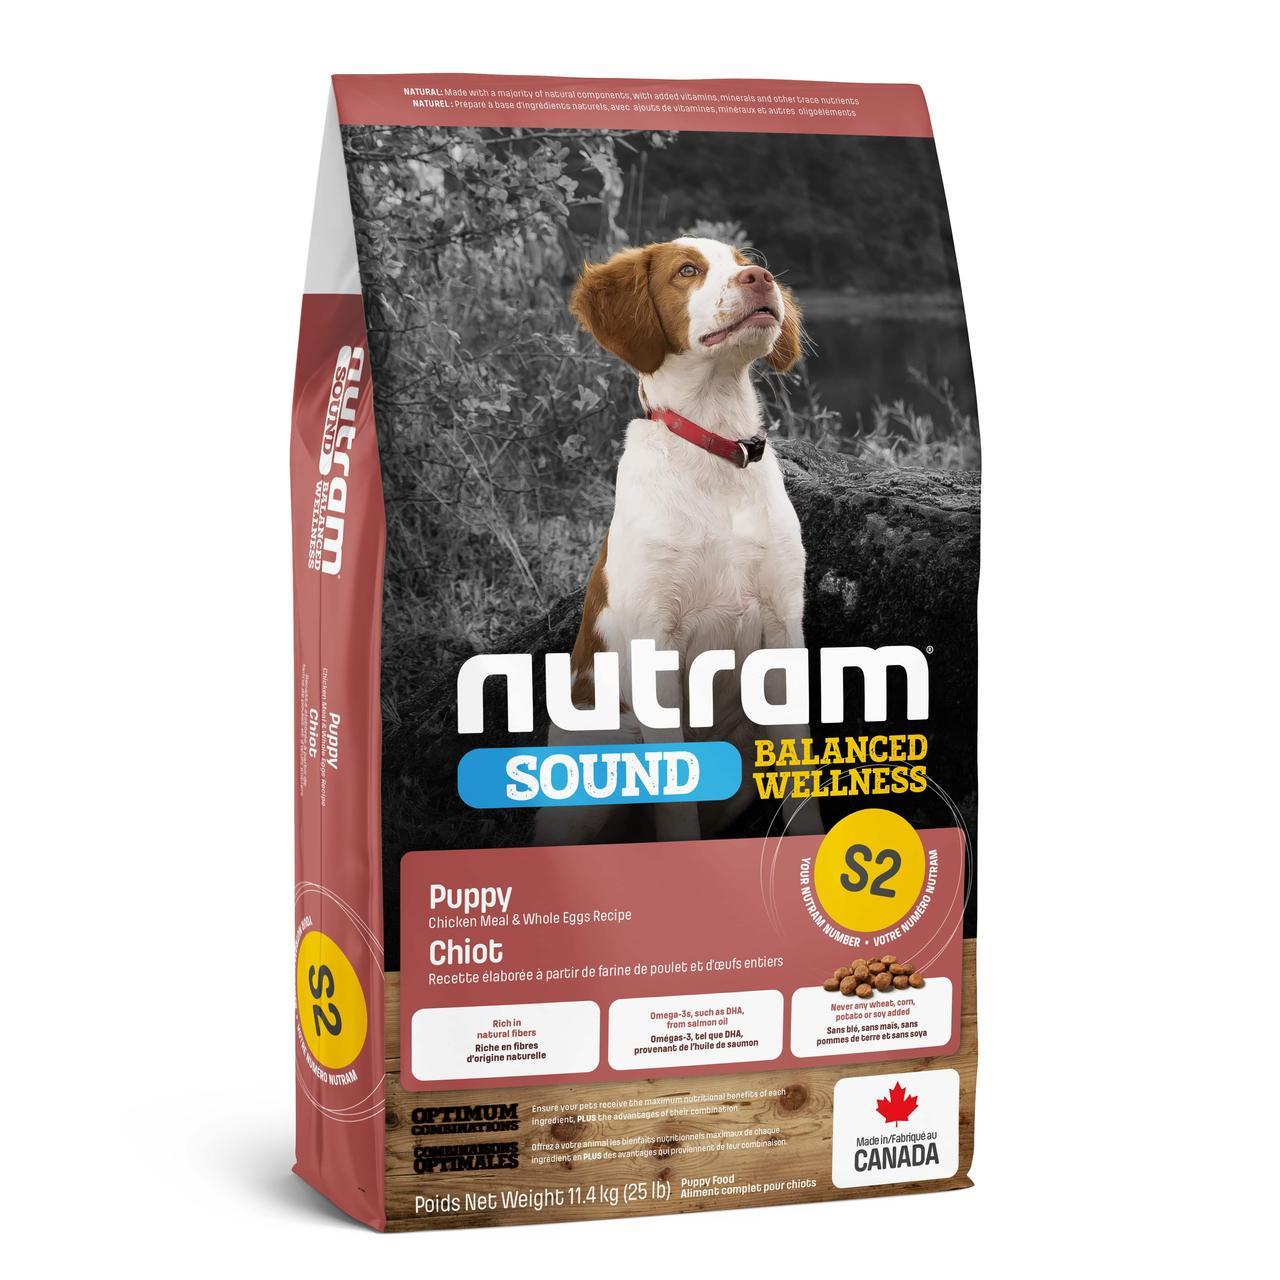 S2 Nutram Sound Puppy 20кг - корм для щенков (белый мешок)